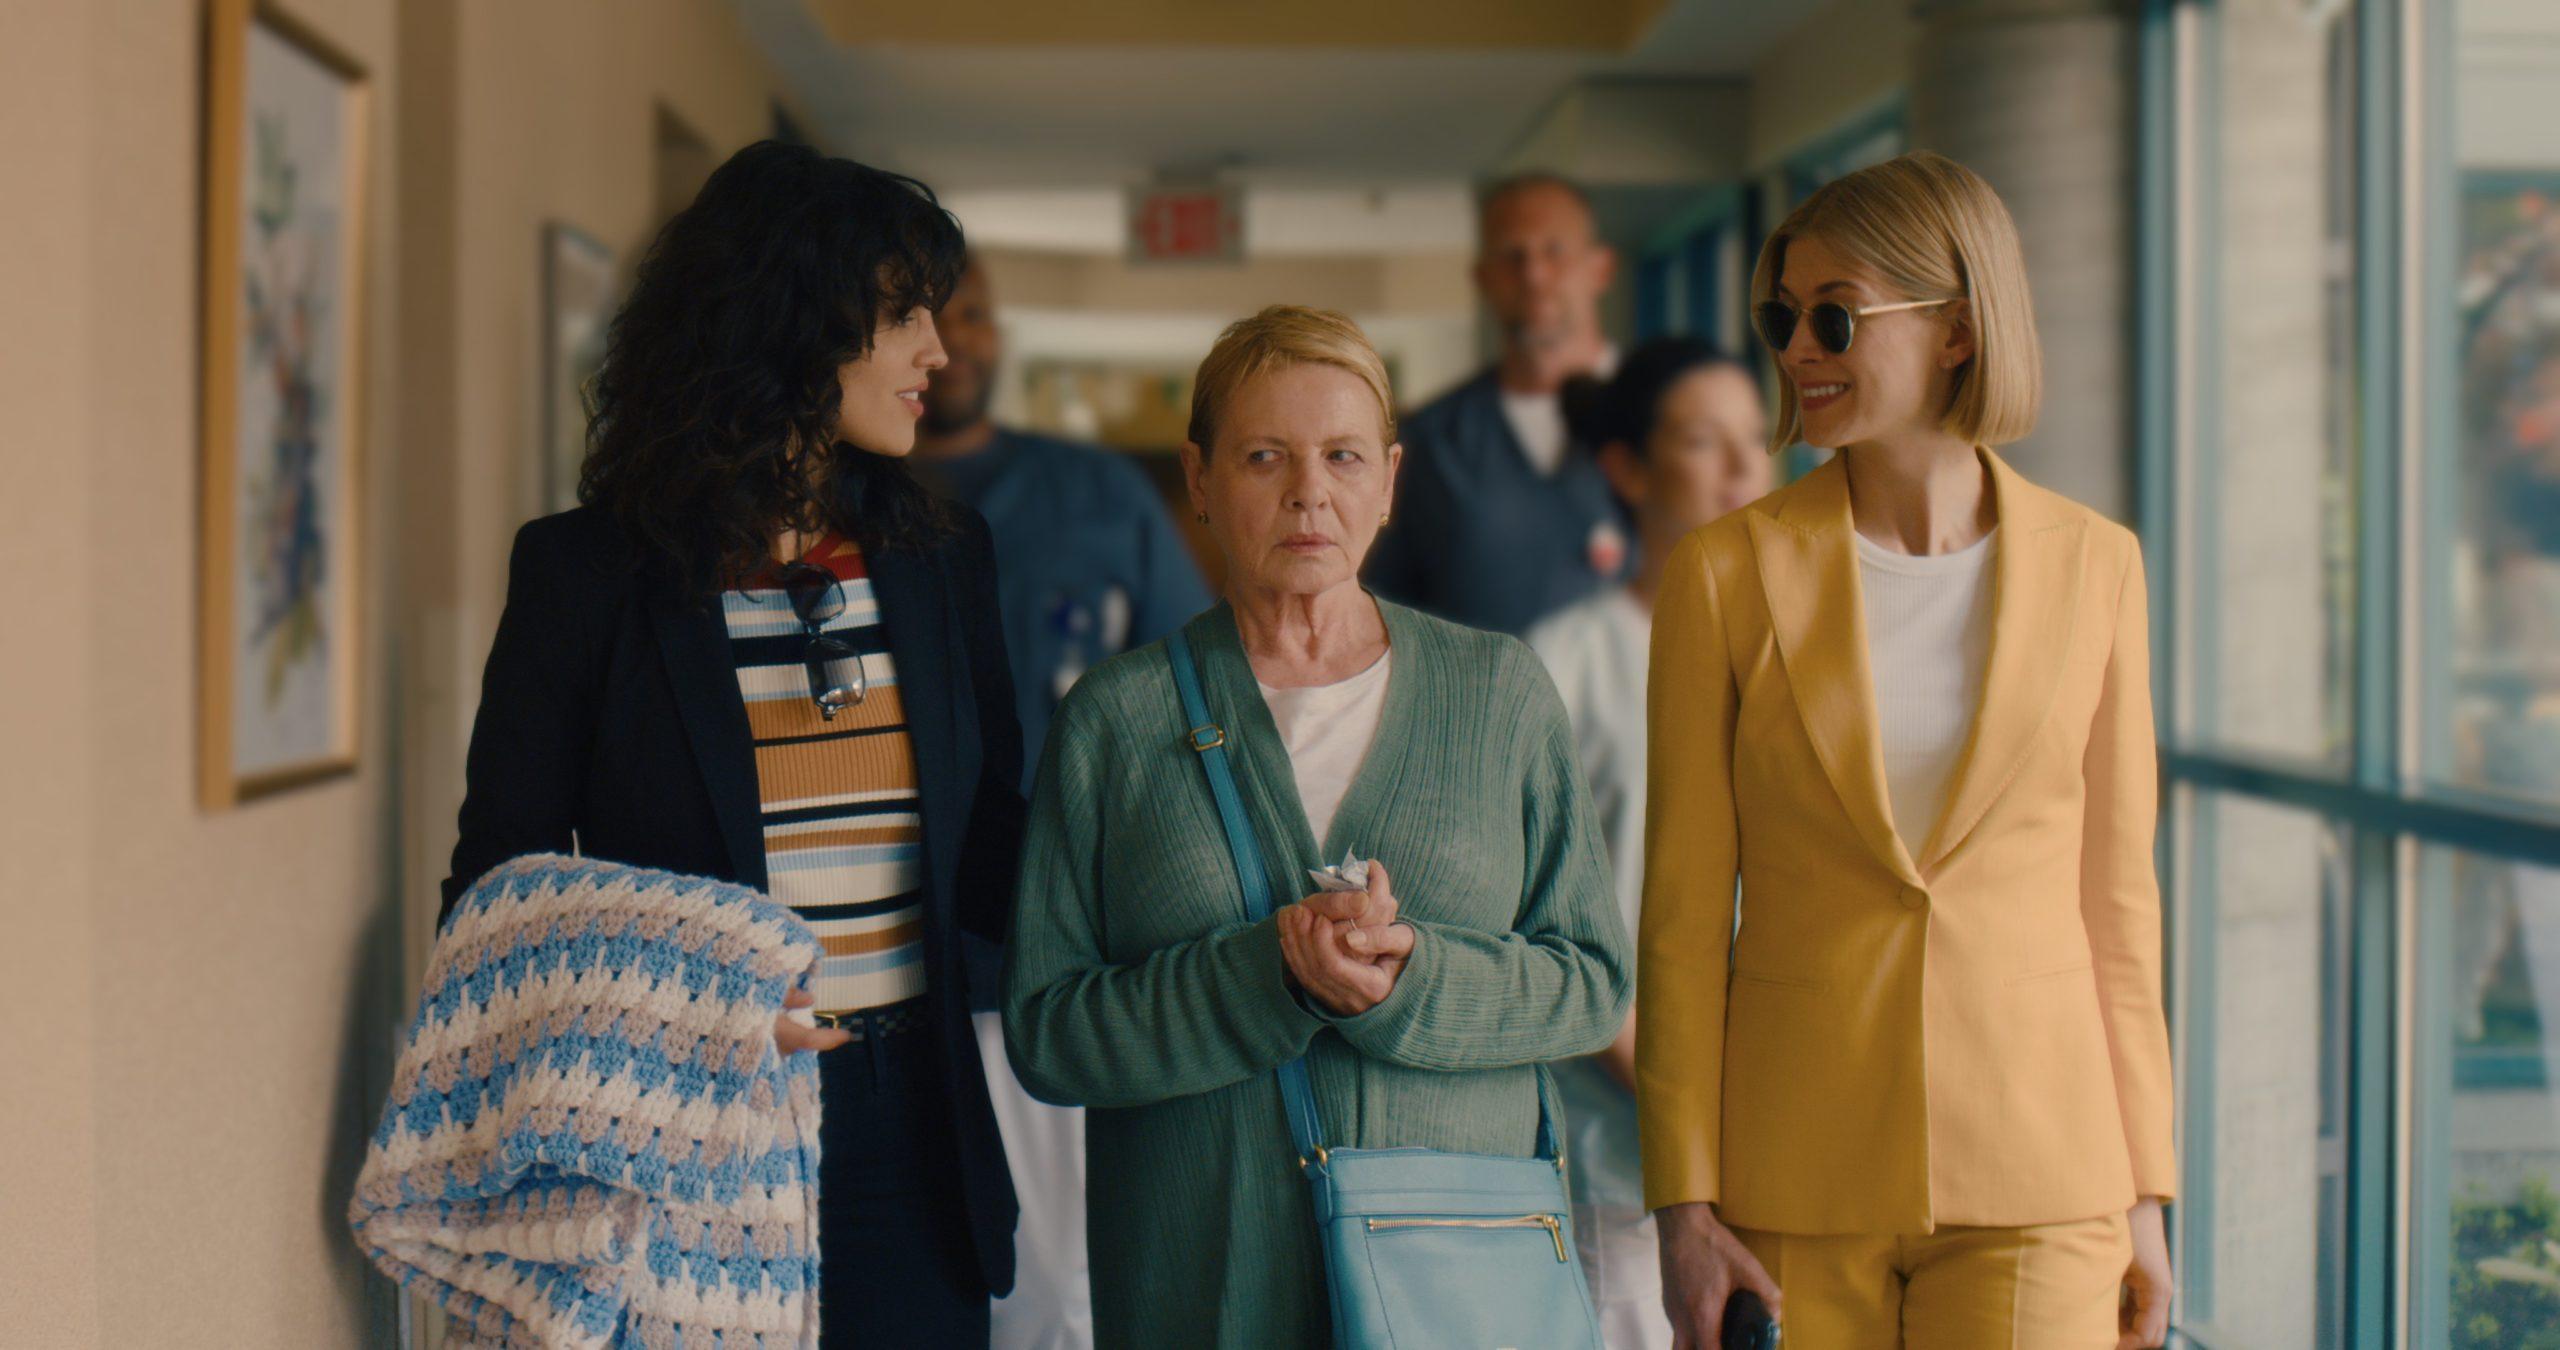 Eiza González, Dianne West und Rosamund Pike in I Care A Lot.